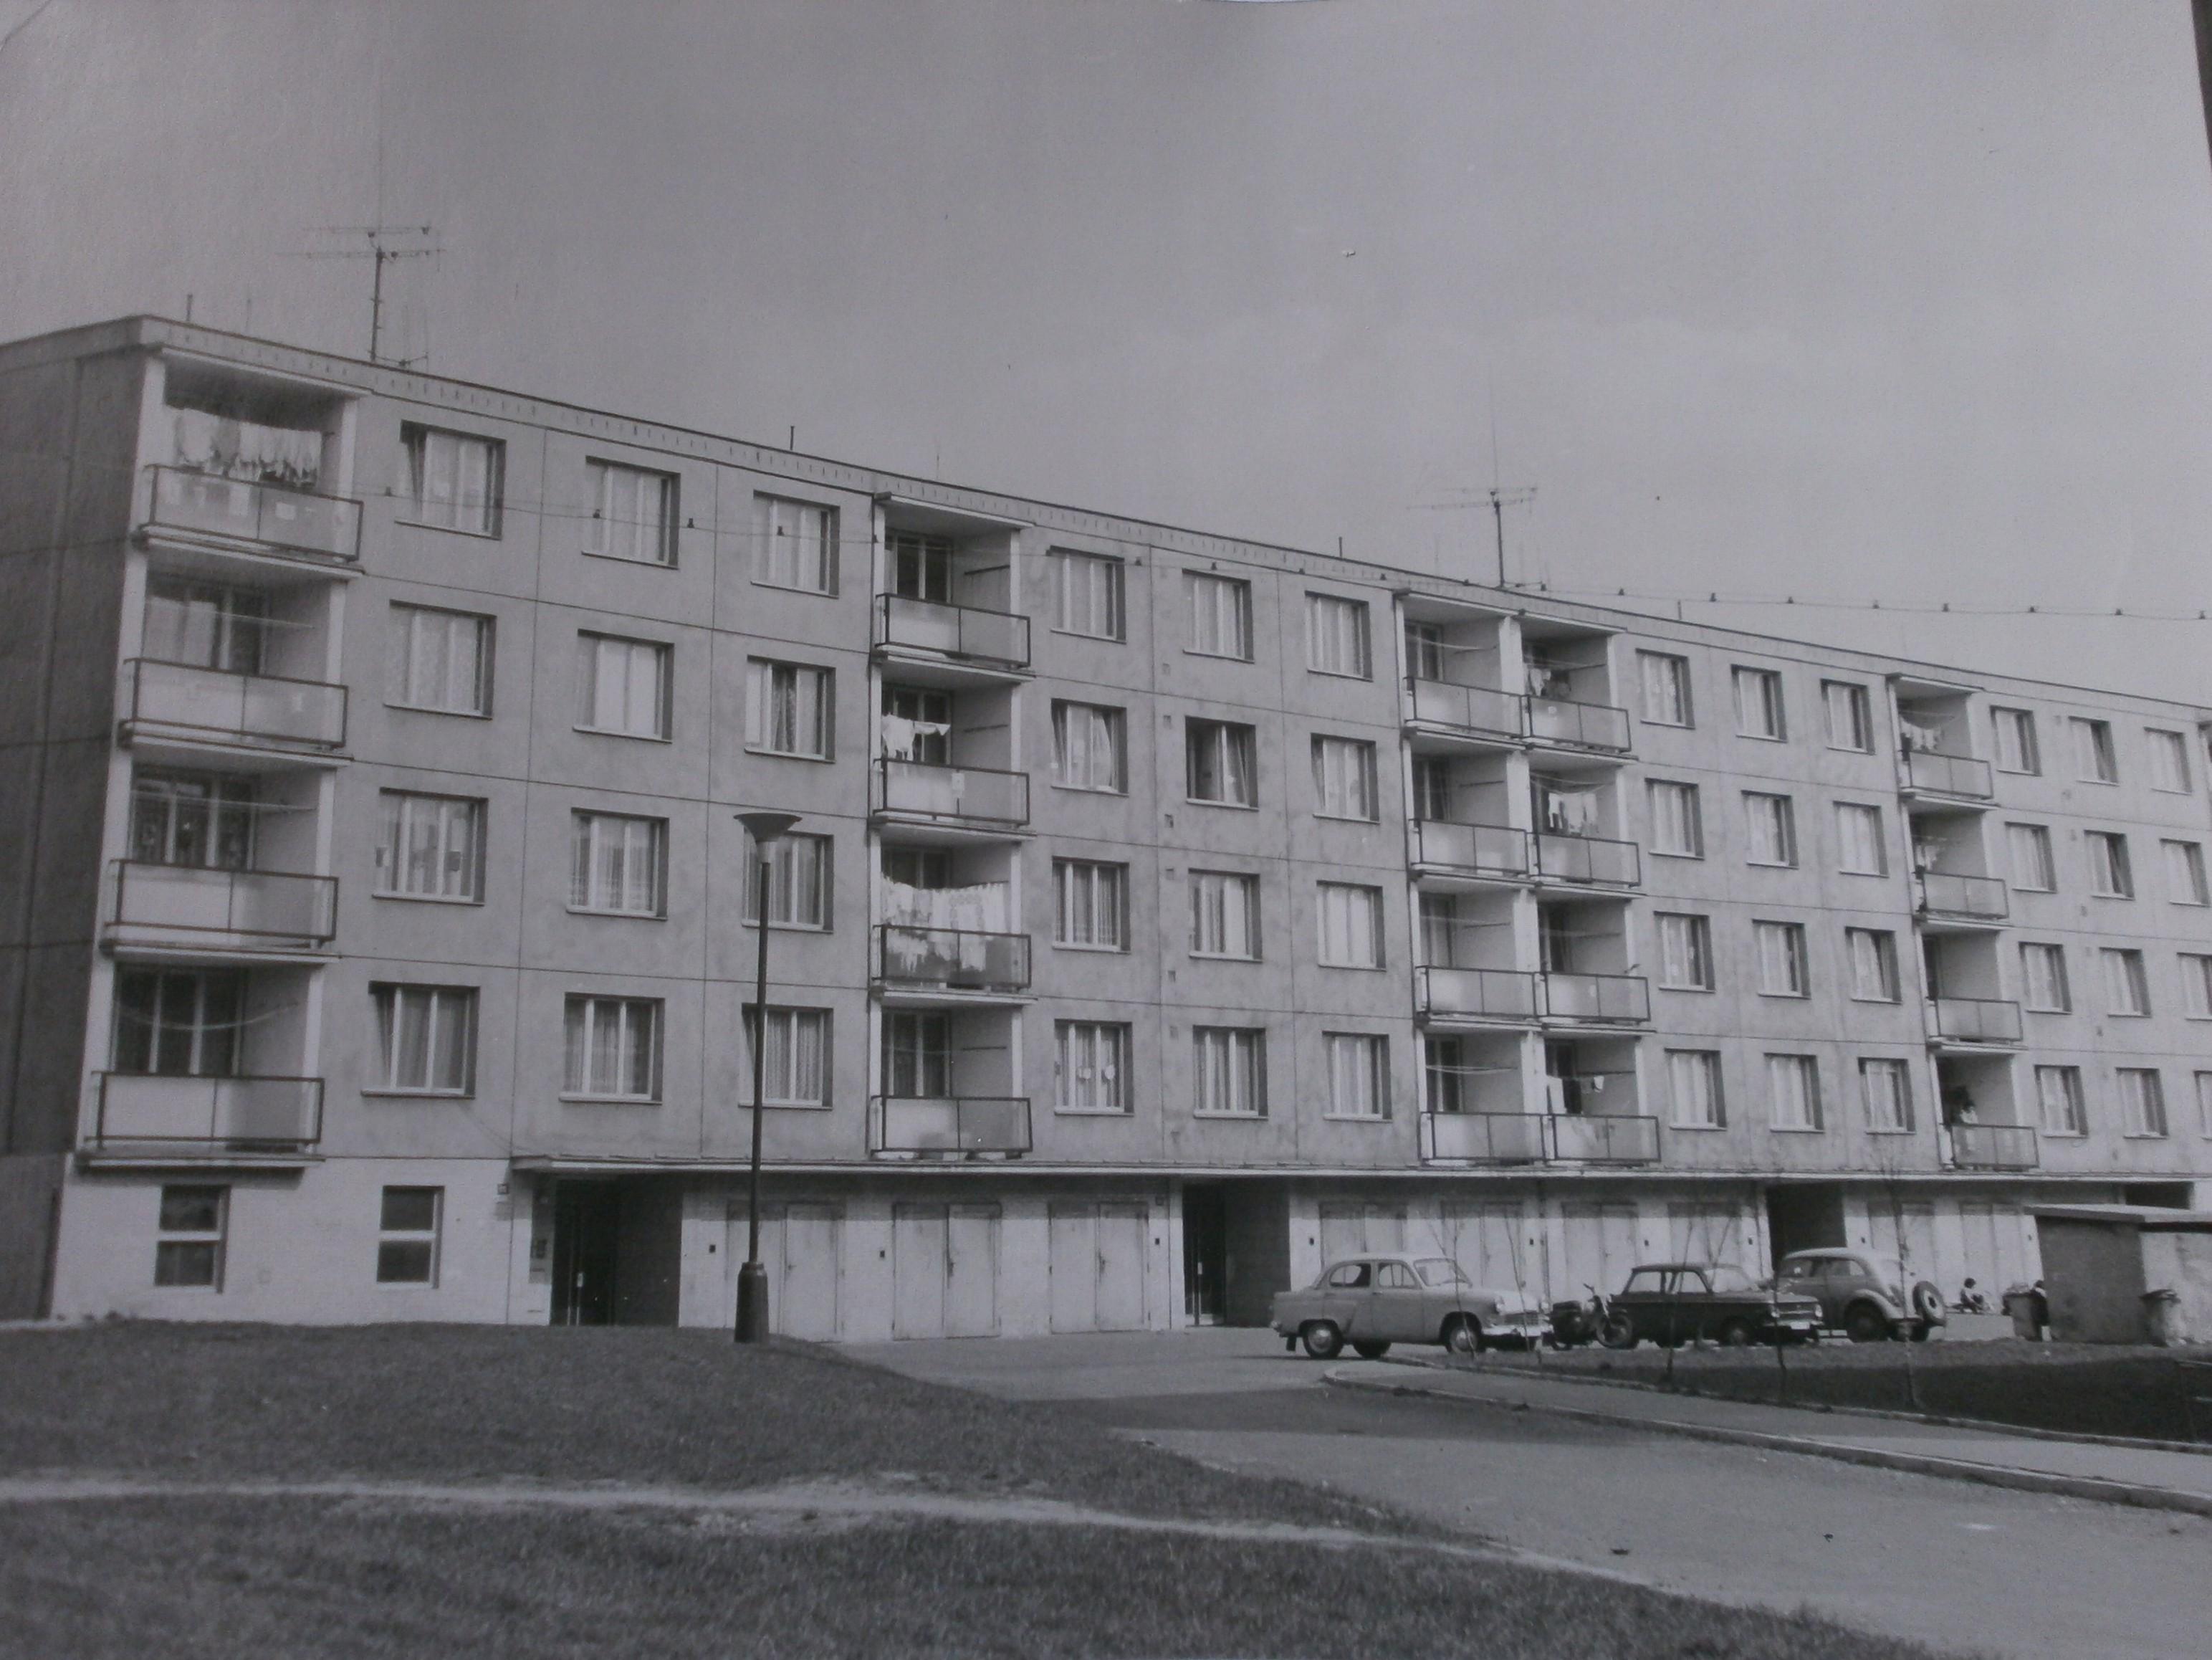 248-Pohled_na_panelovy_dum_c.p._172_-_175_(1974).JPG